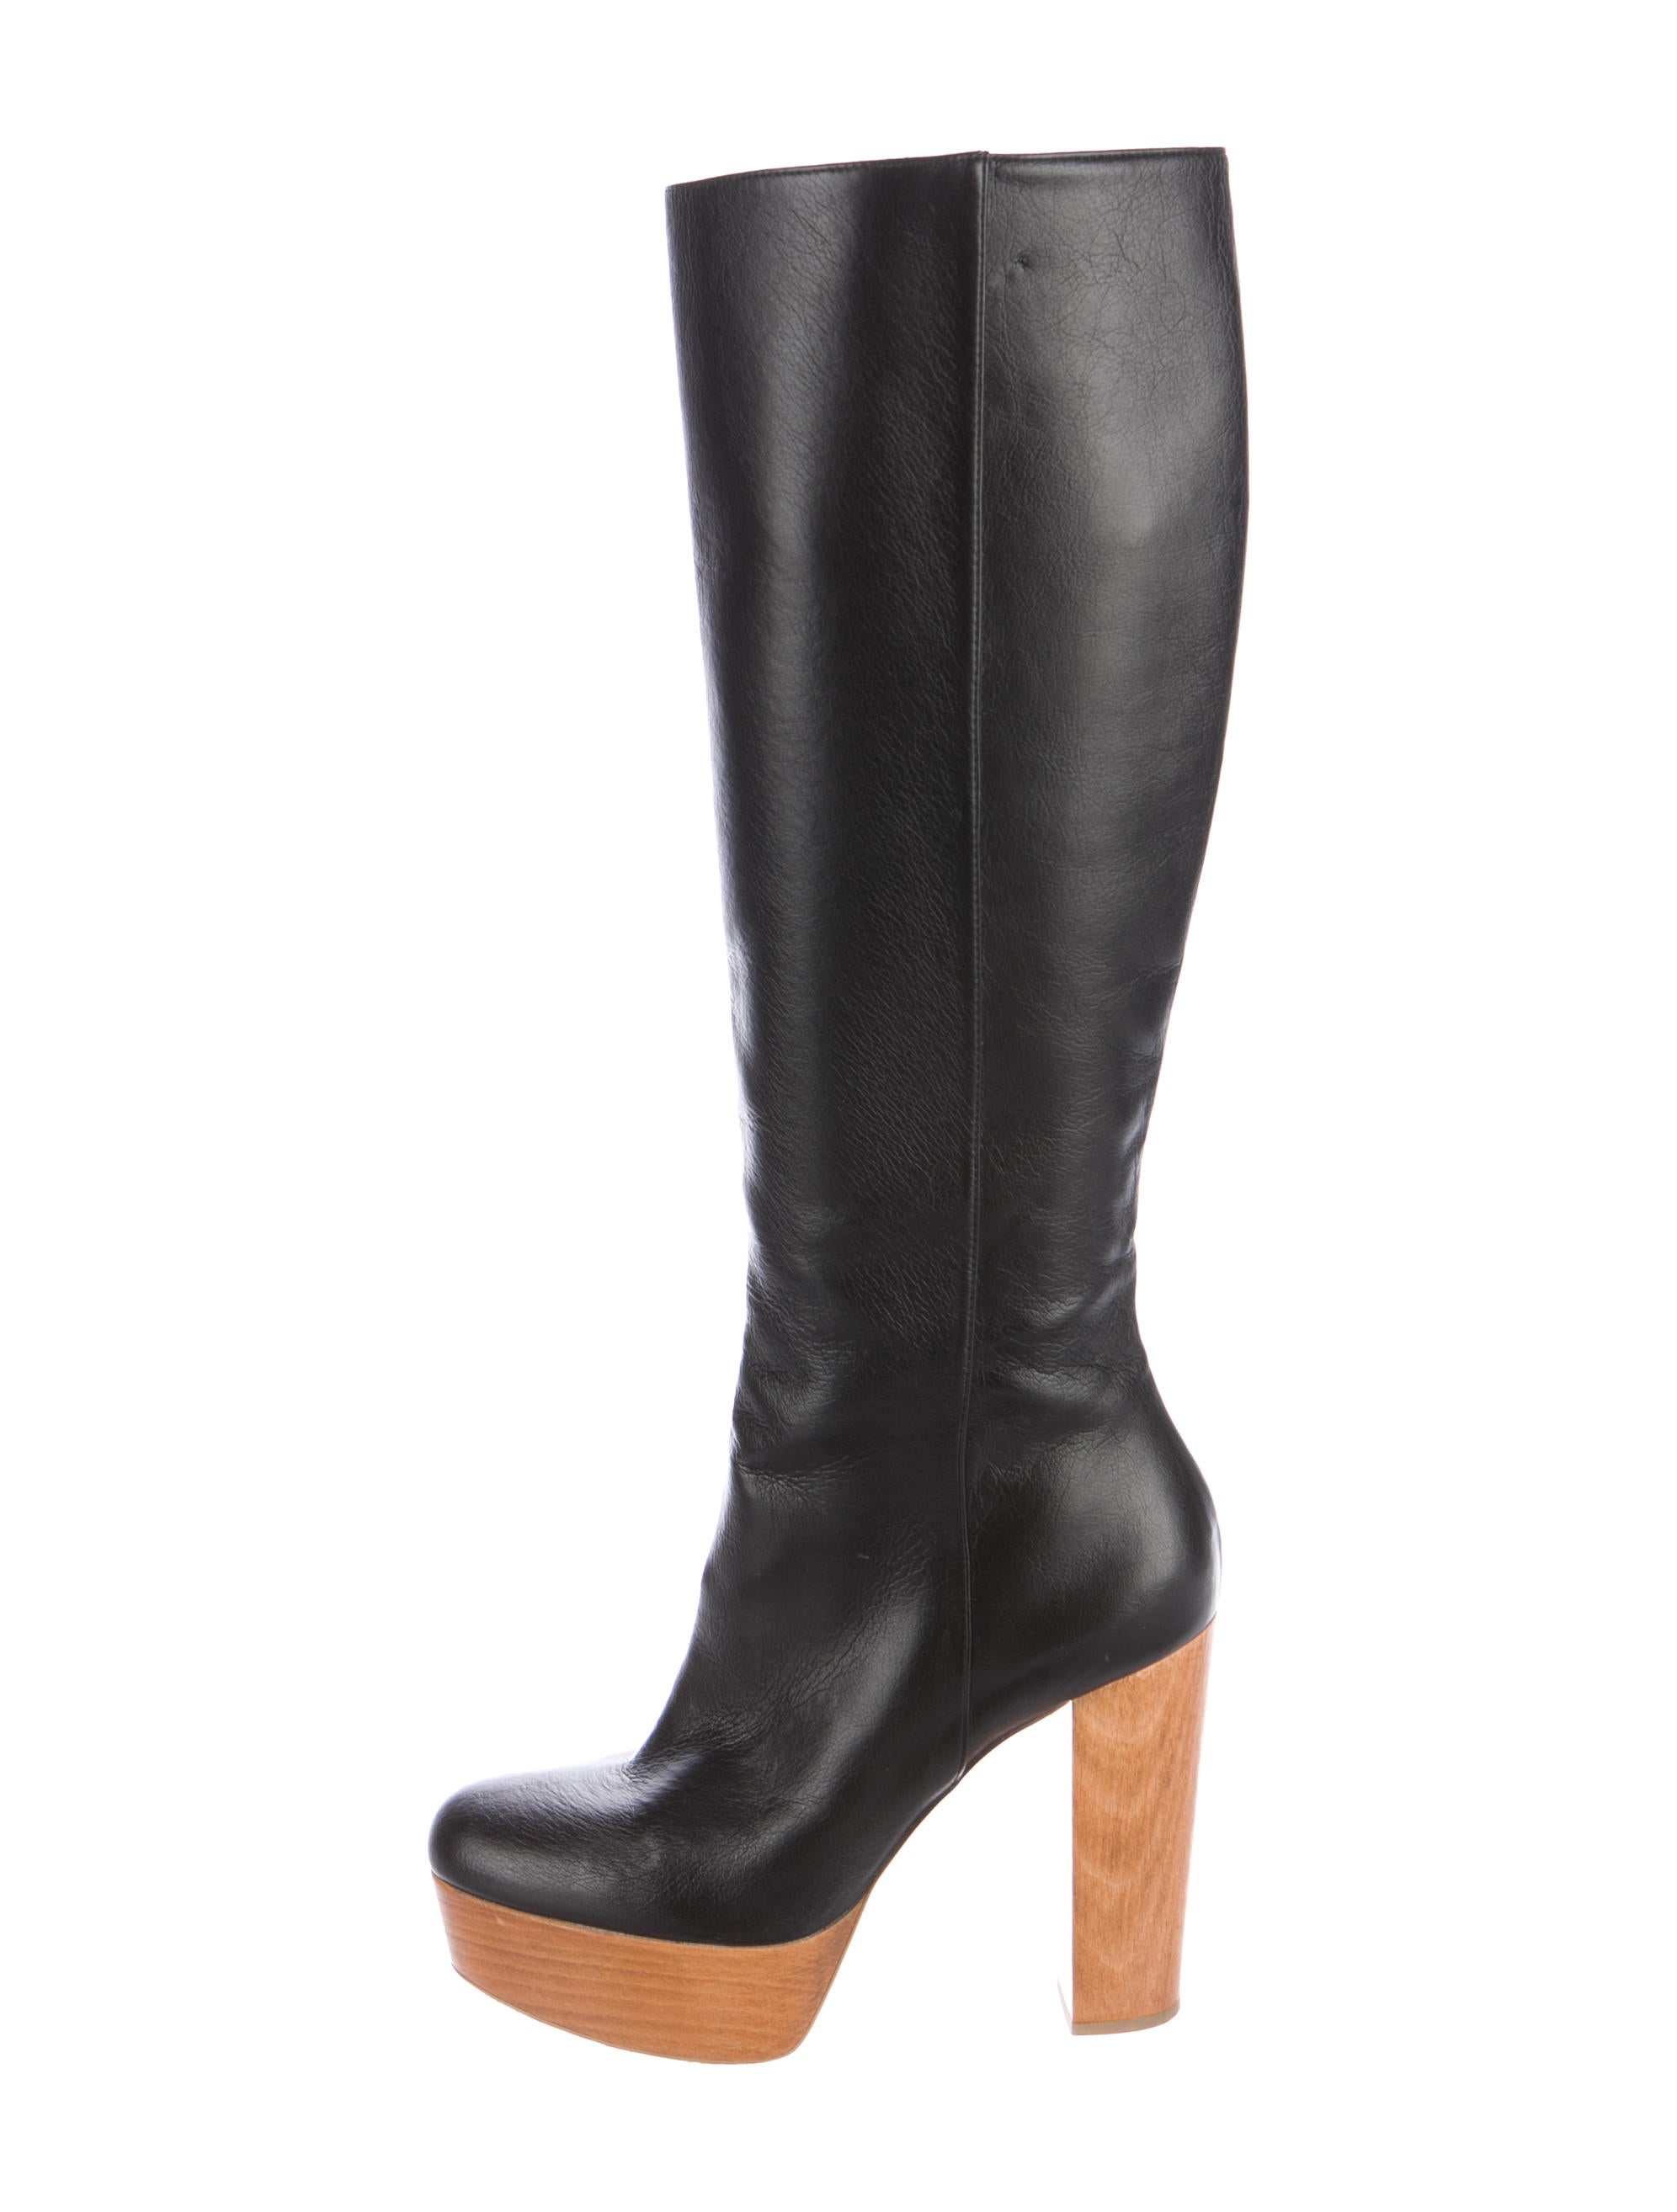 stella mccartney vegan leather platform boots shoes